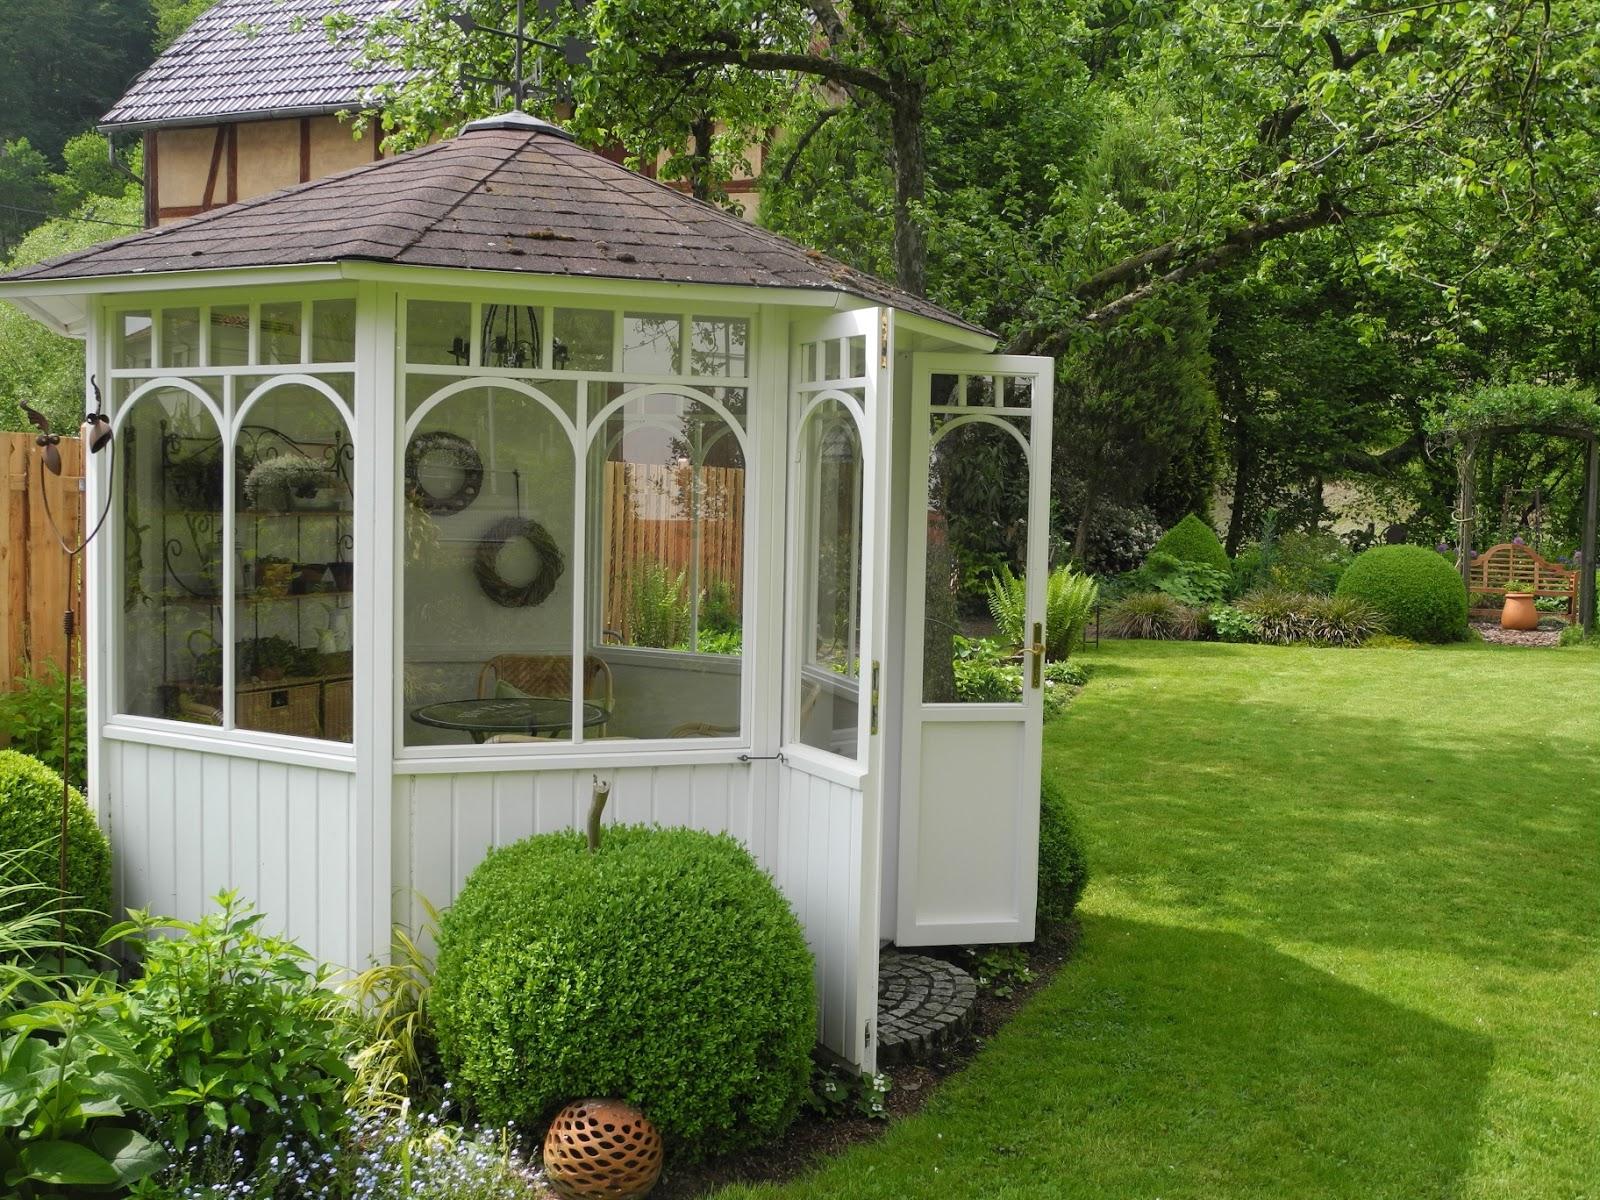 schmiedegarten deko f rs gartenhaus. Black Bedroom Furniture Sets. Home Design Ideas